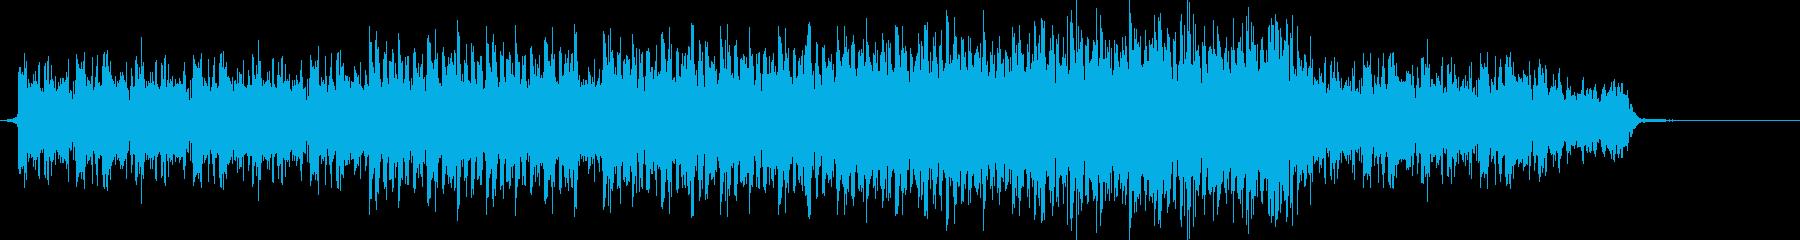 V-LOGなどおしゃれな映像に合うBGMの再生済みの波形